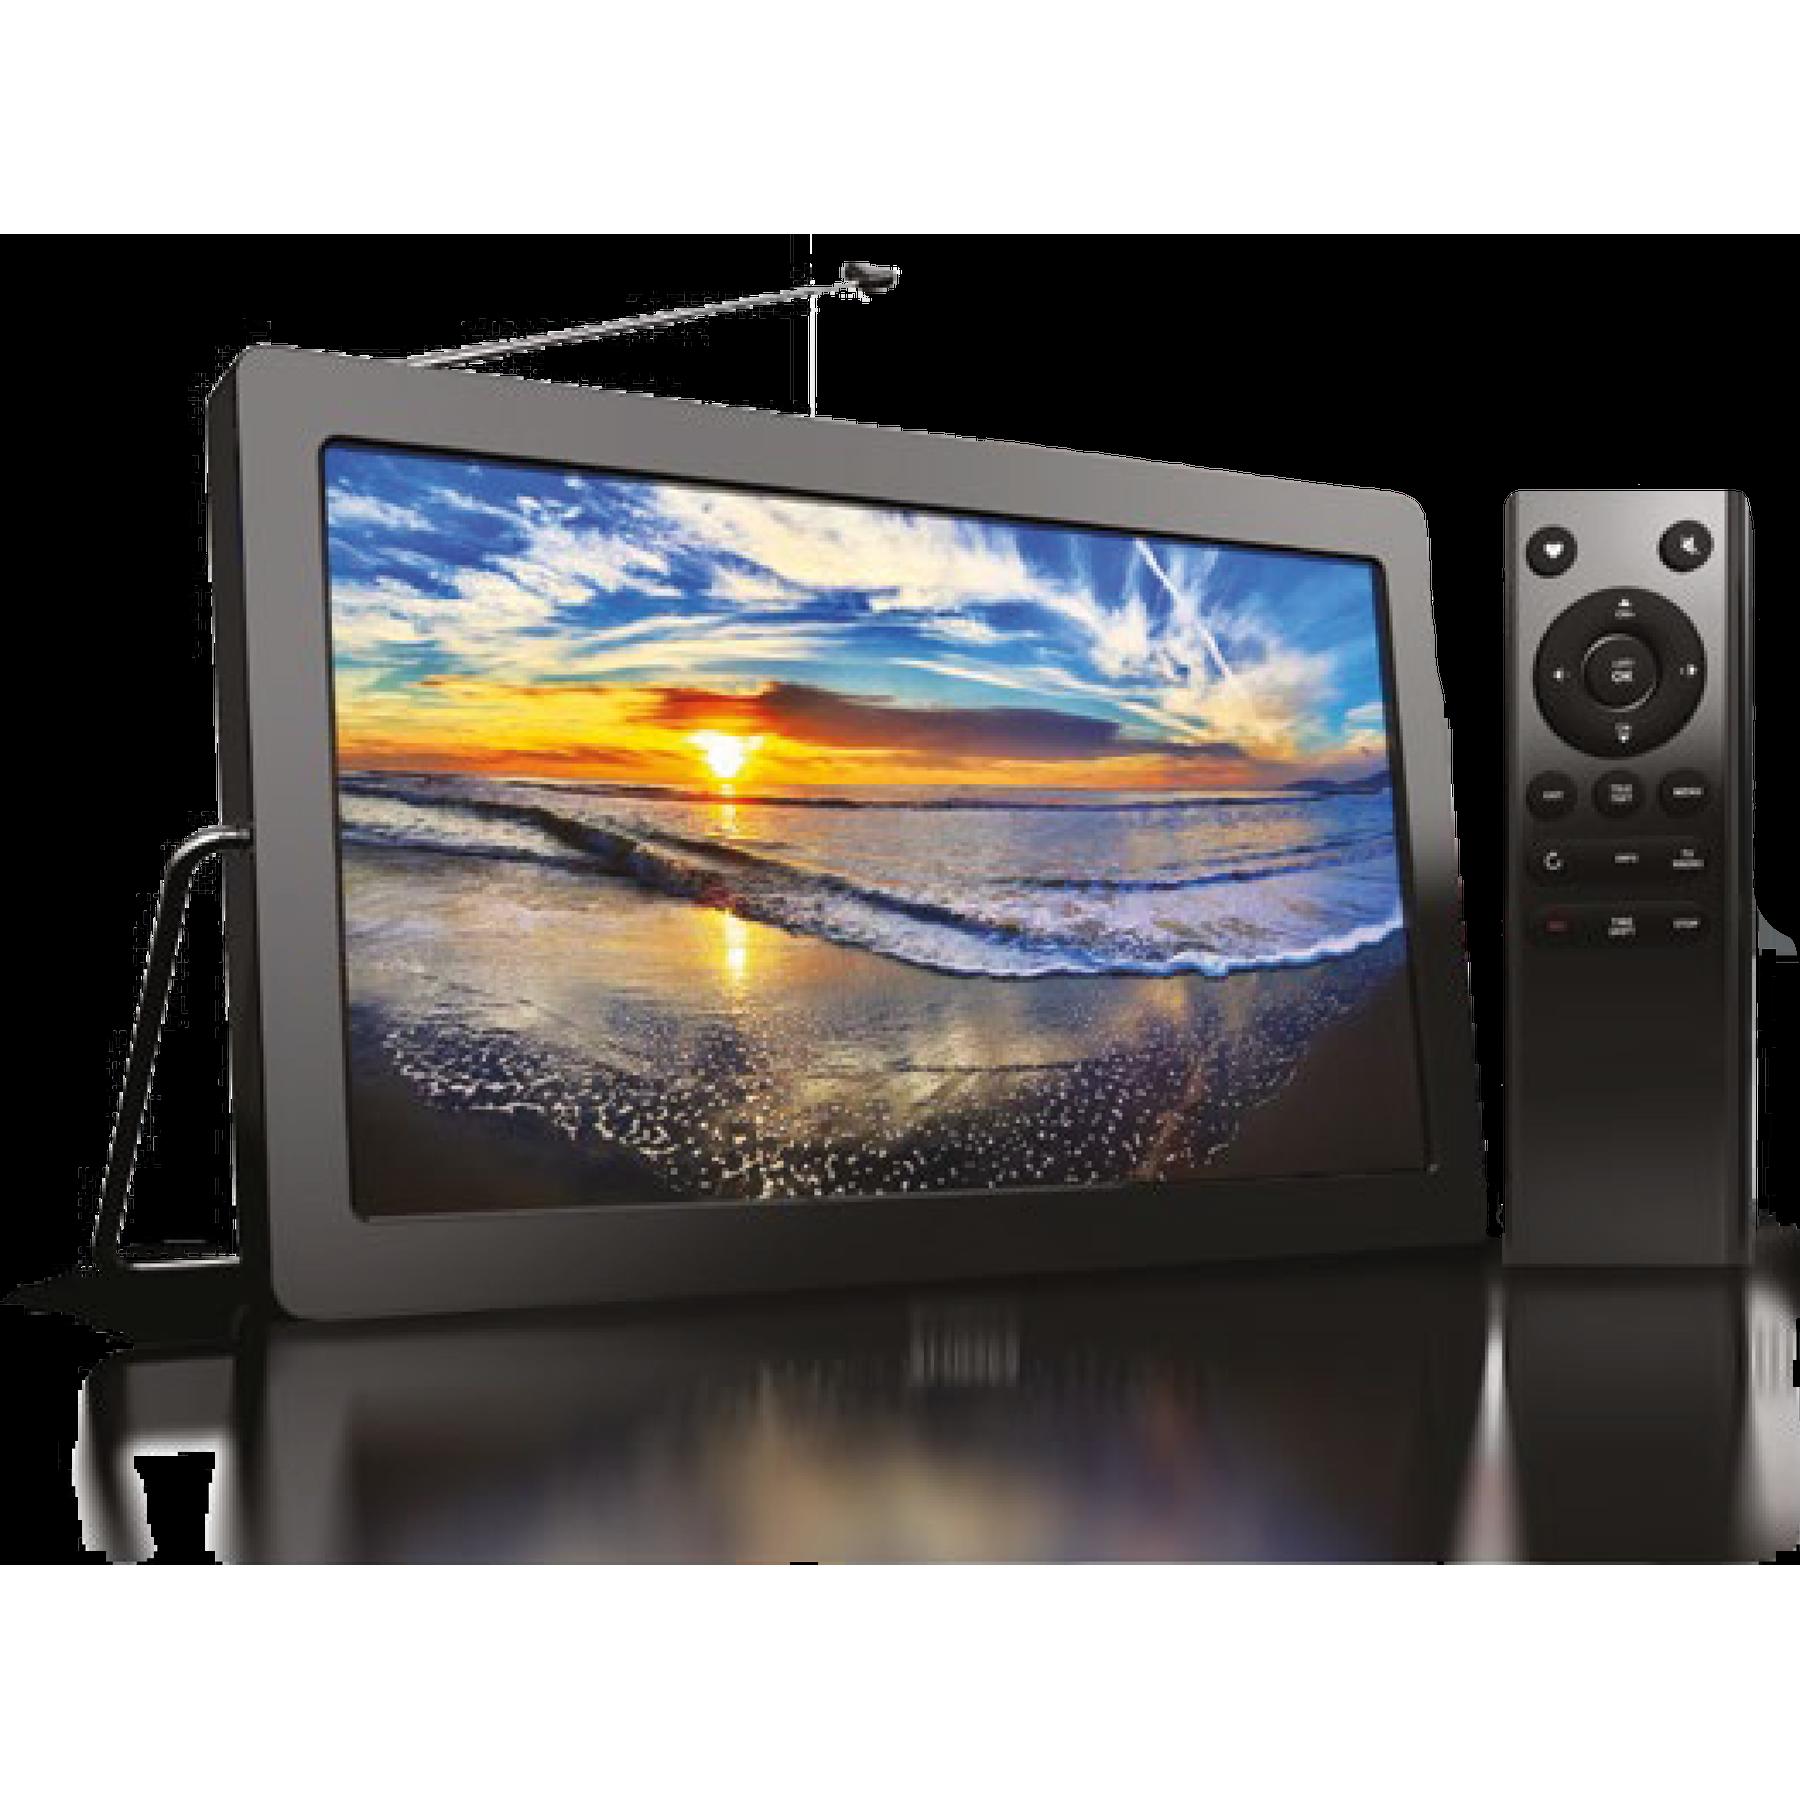 Телевизор портативный MEZZO 9XLF7T01T2 экран 9